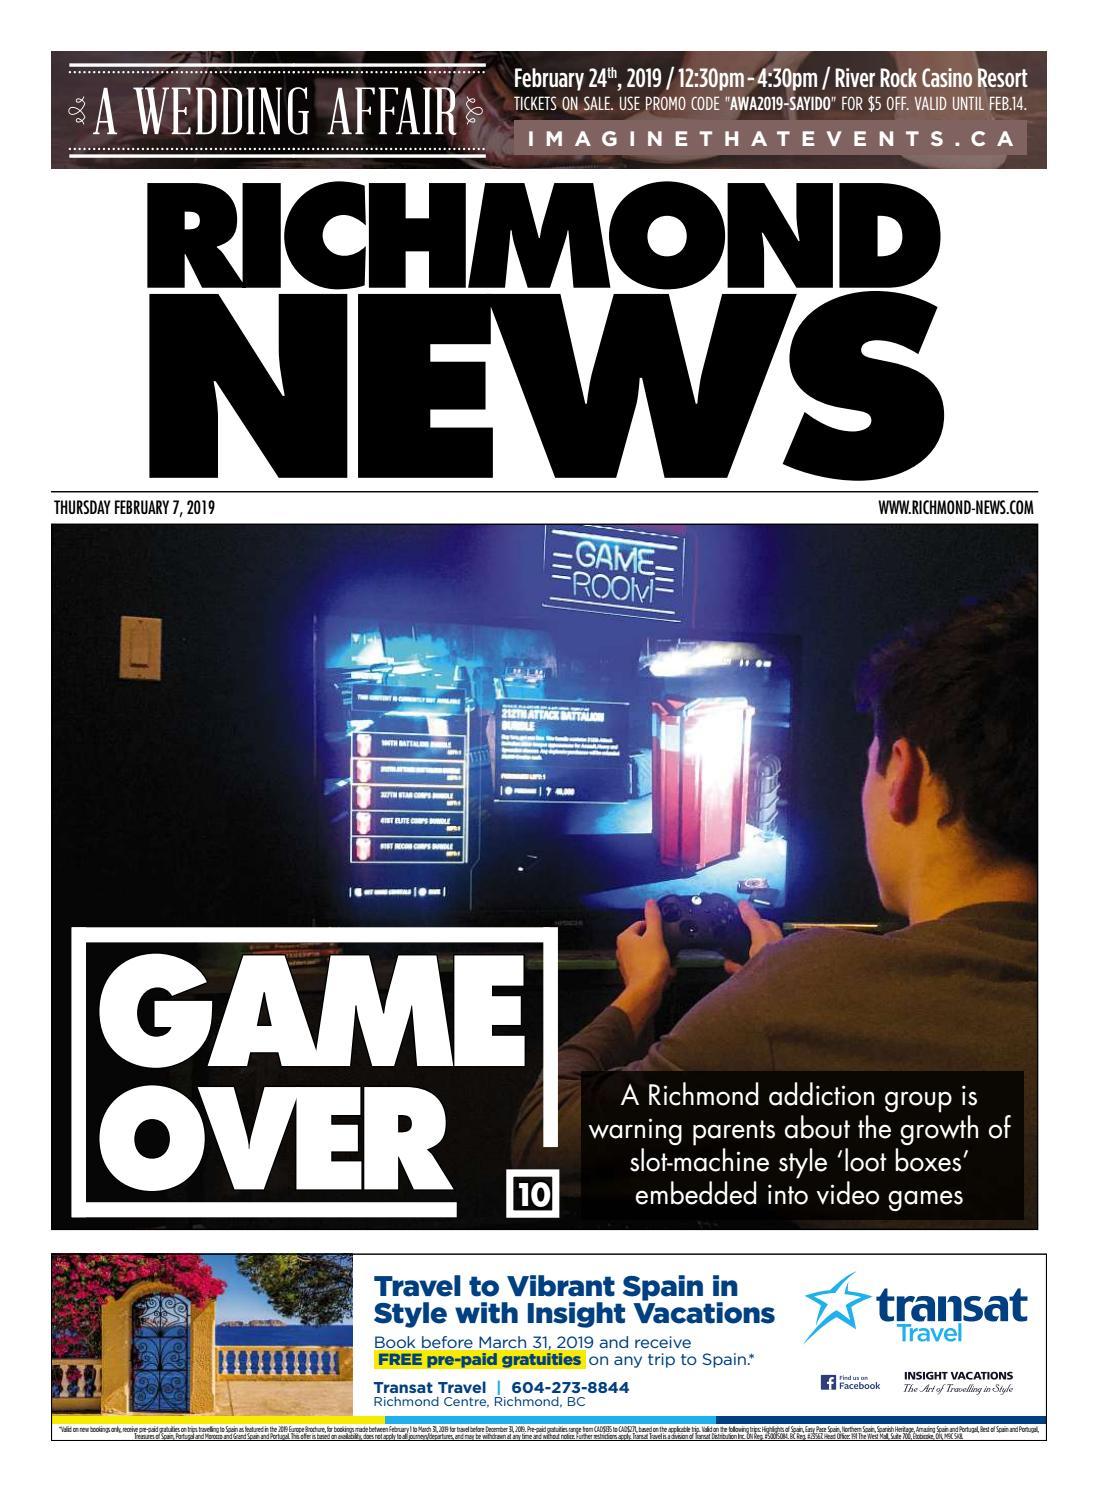 Richmond News February 7 2019 by Richmond News - issuu